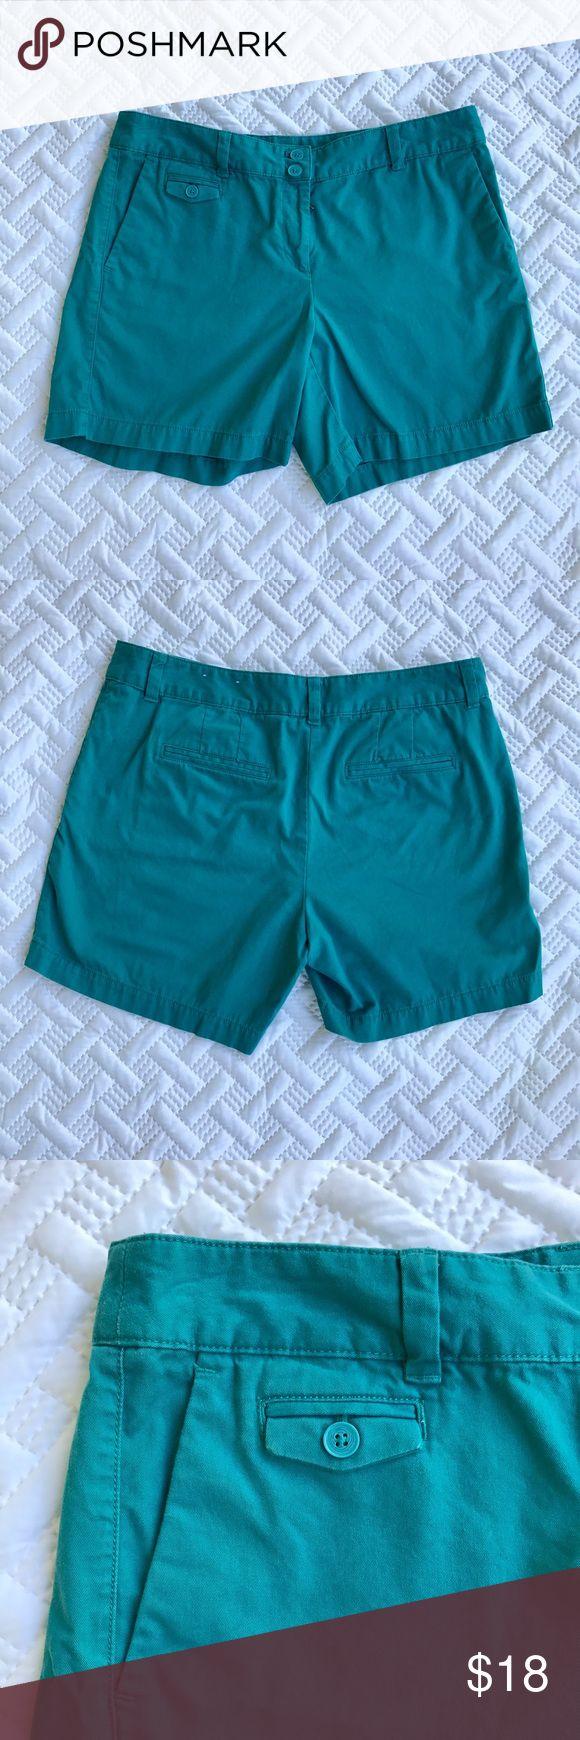 "Teal Shorts 8 Casual Ann Taylor Loft Original Ann Taylor Loft ""Original"" Short   Size 8   Teal / Turquoise color LOFT Shorts"